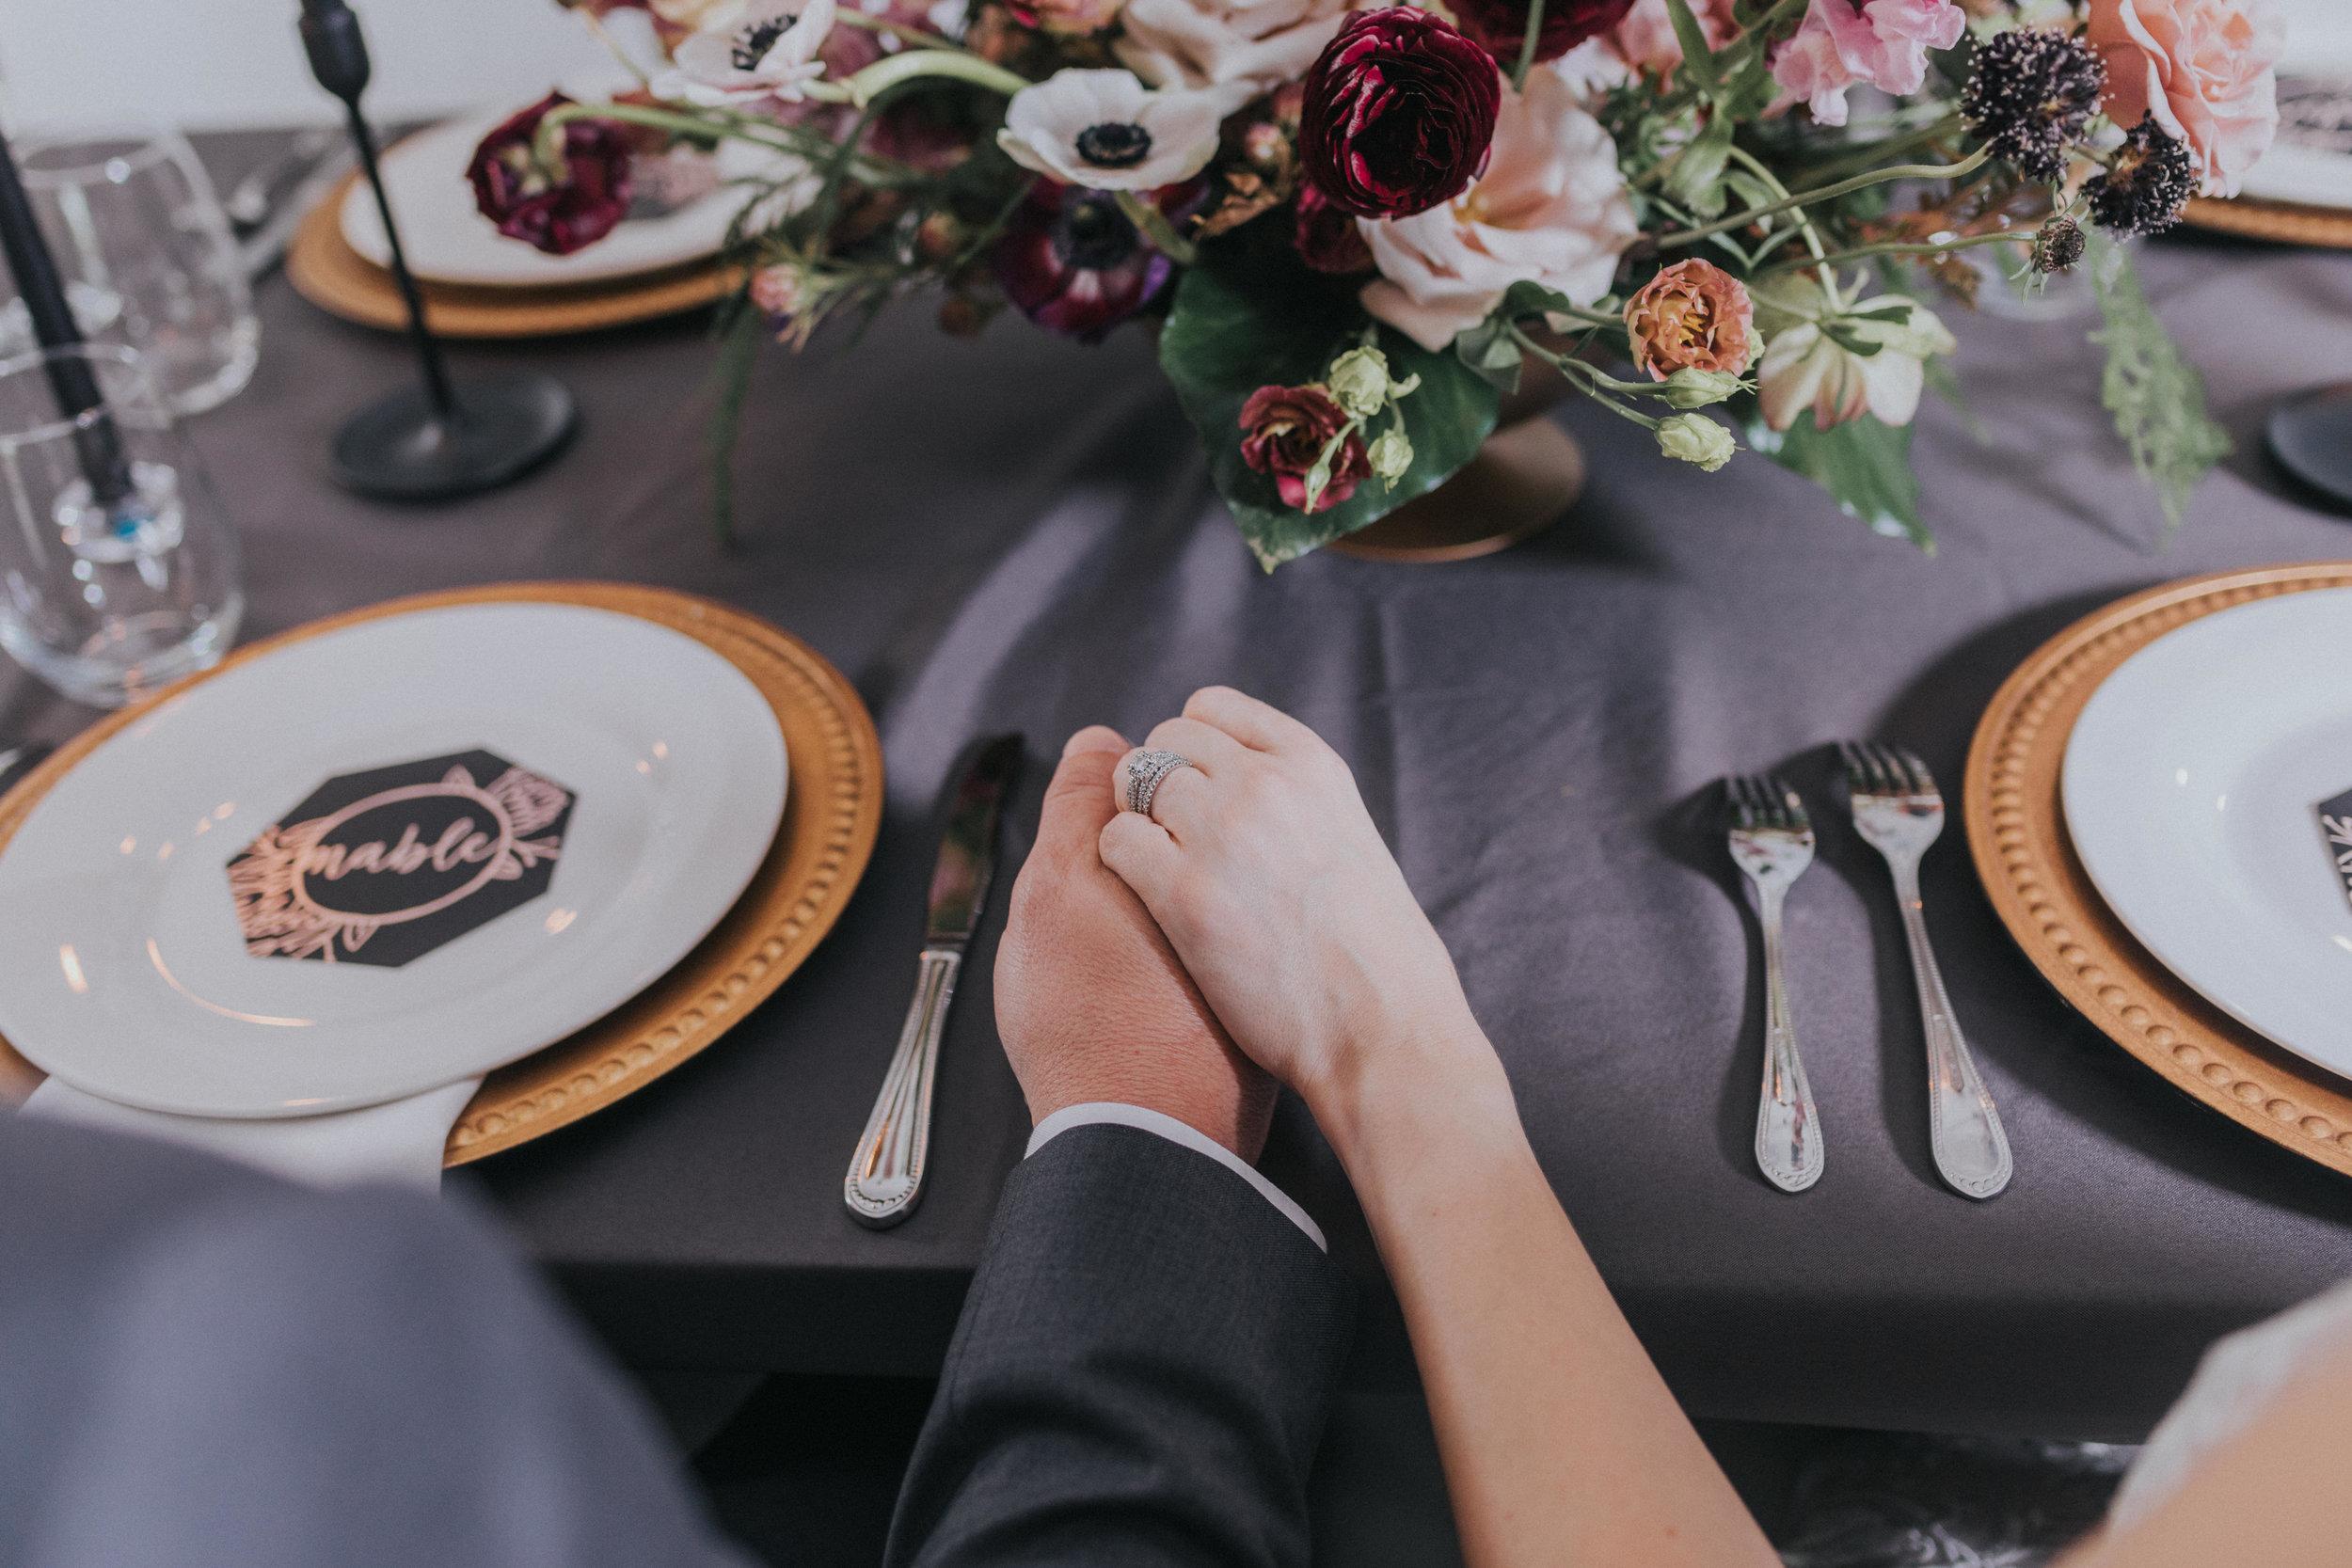 155 tiny-luxe-weddings-omaha-nebraska-midwest-empire-room.jpg